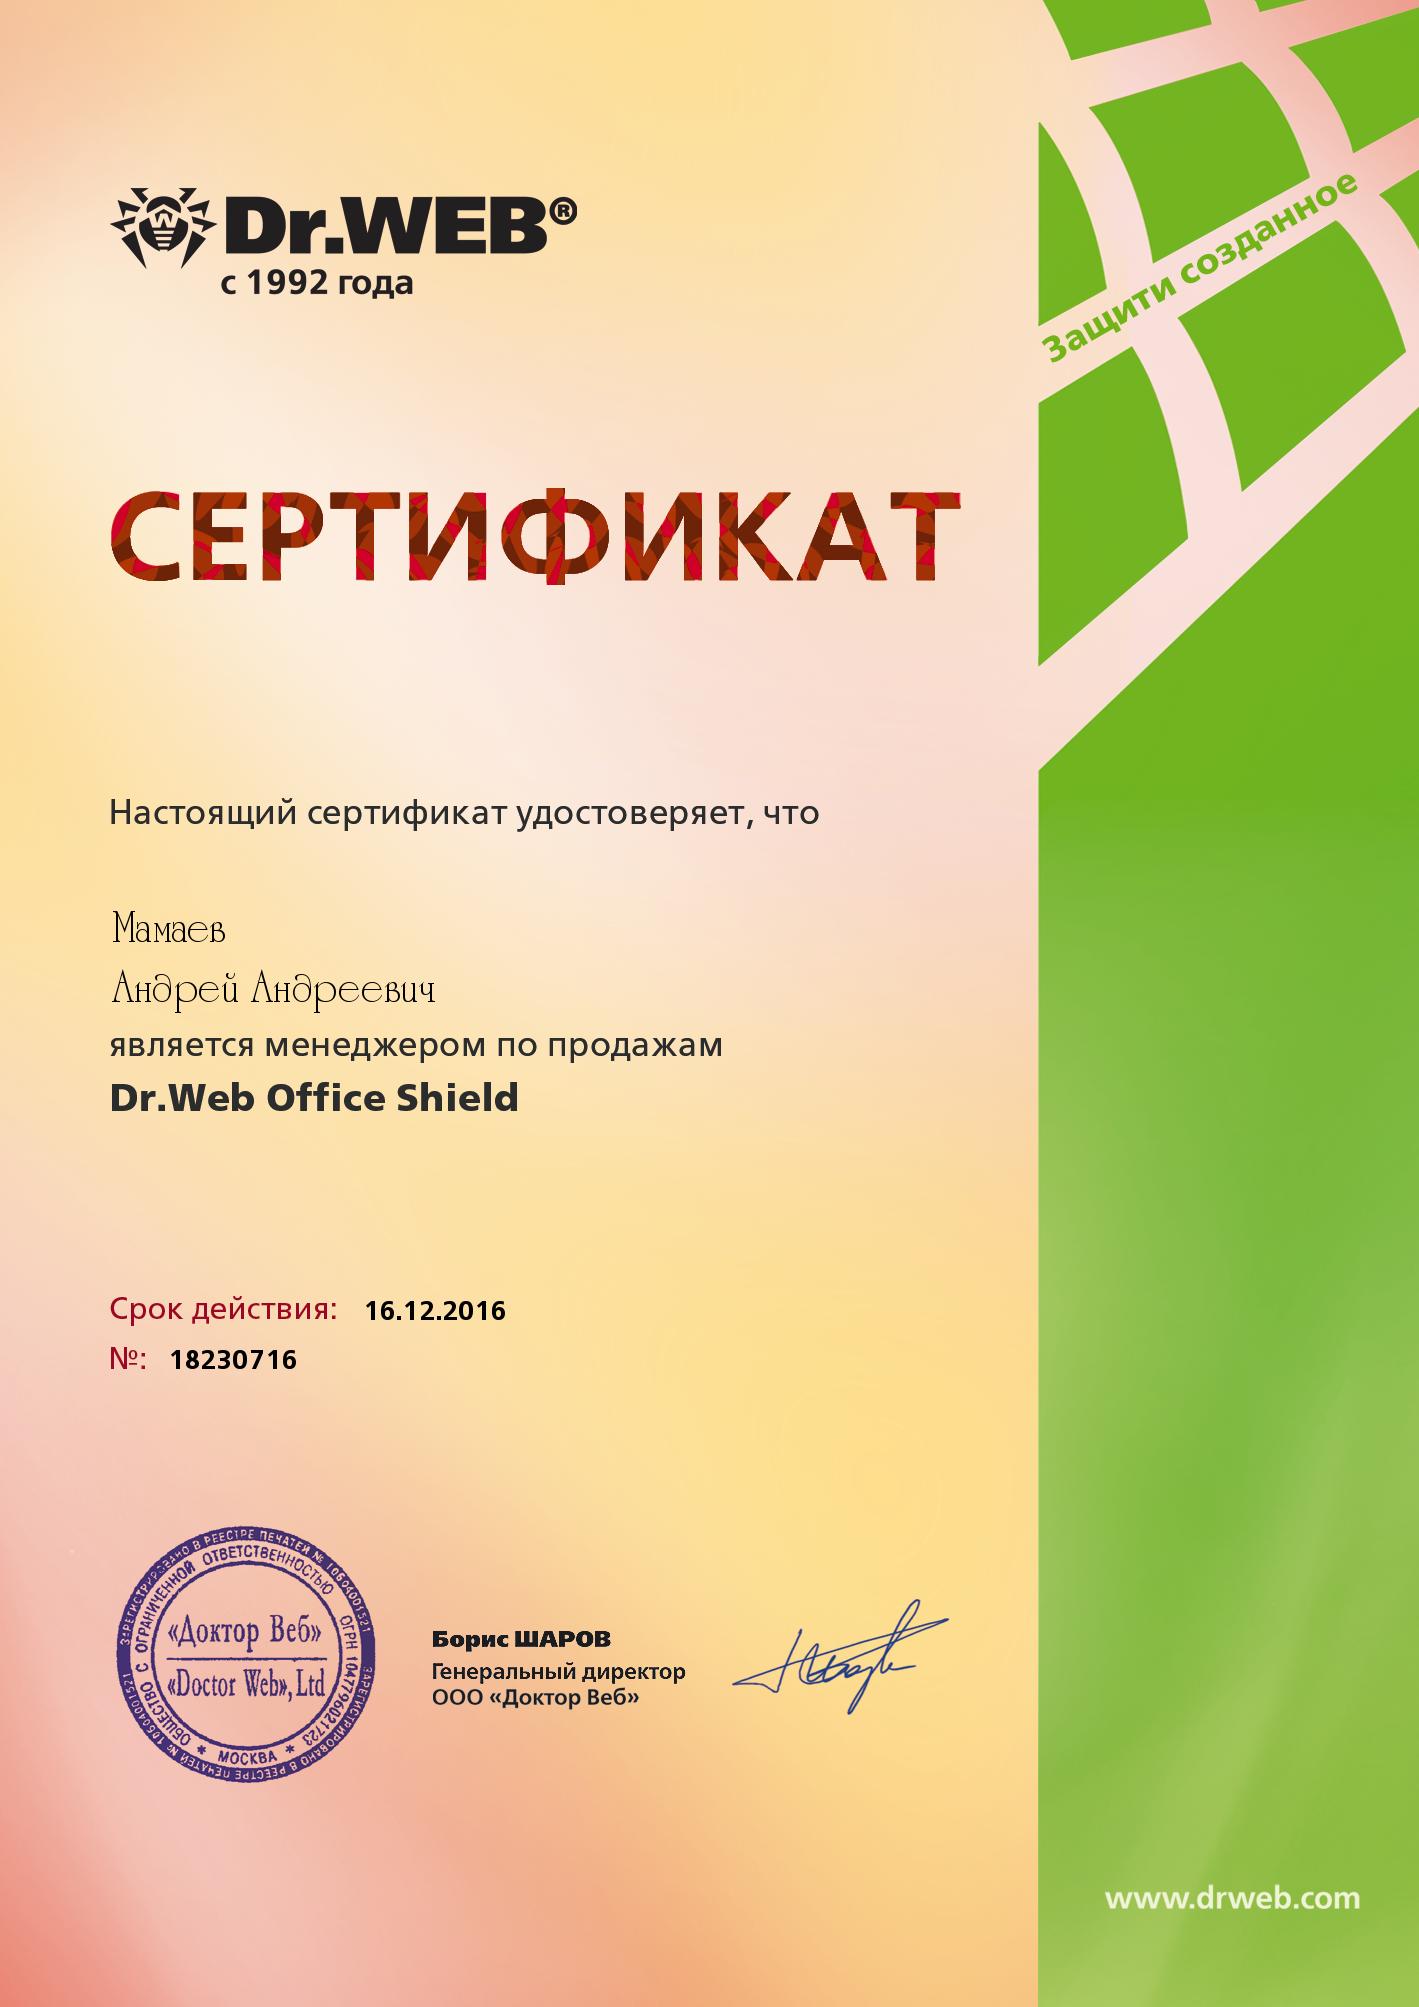 (DWCERT-010-1) Менеджер по продажам Dr.Web Office Shield (Мамаев) 16.12.2016